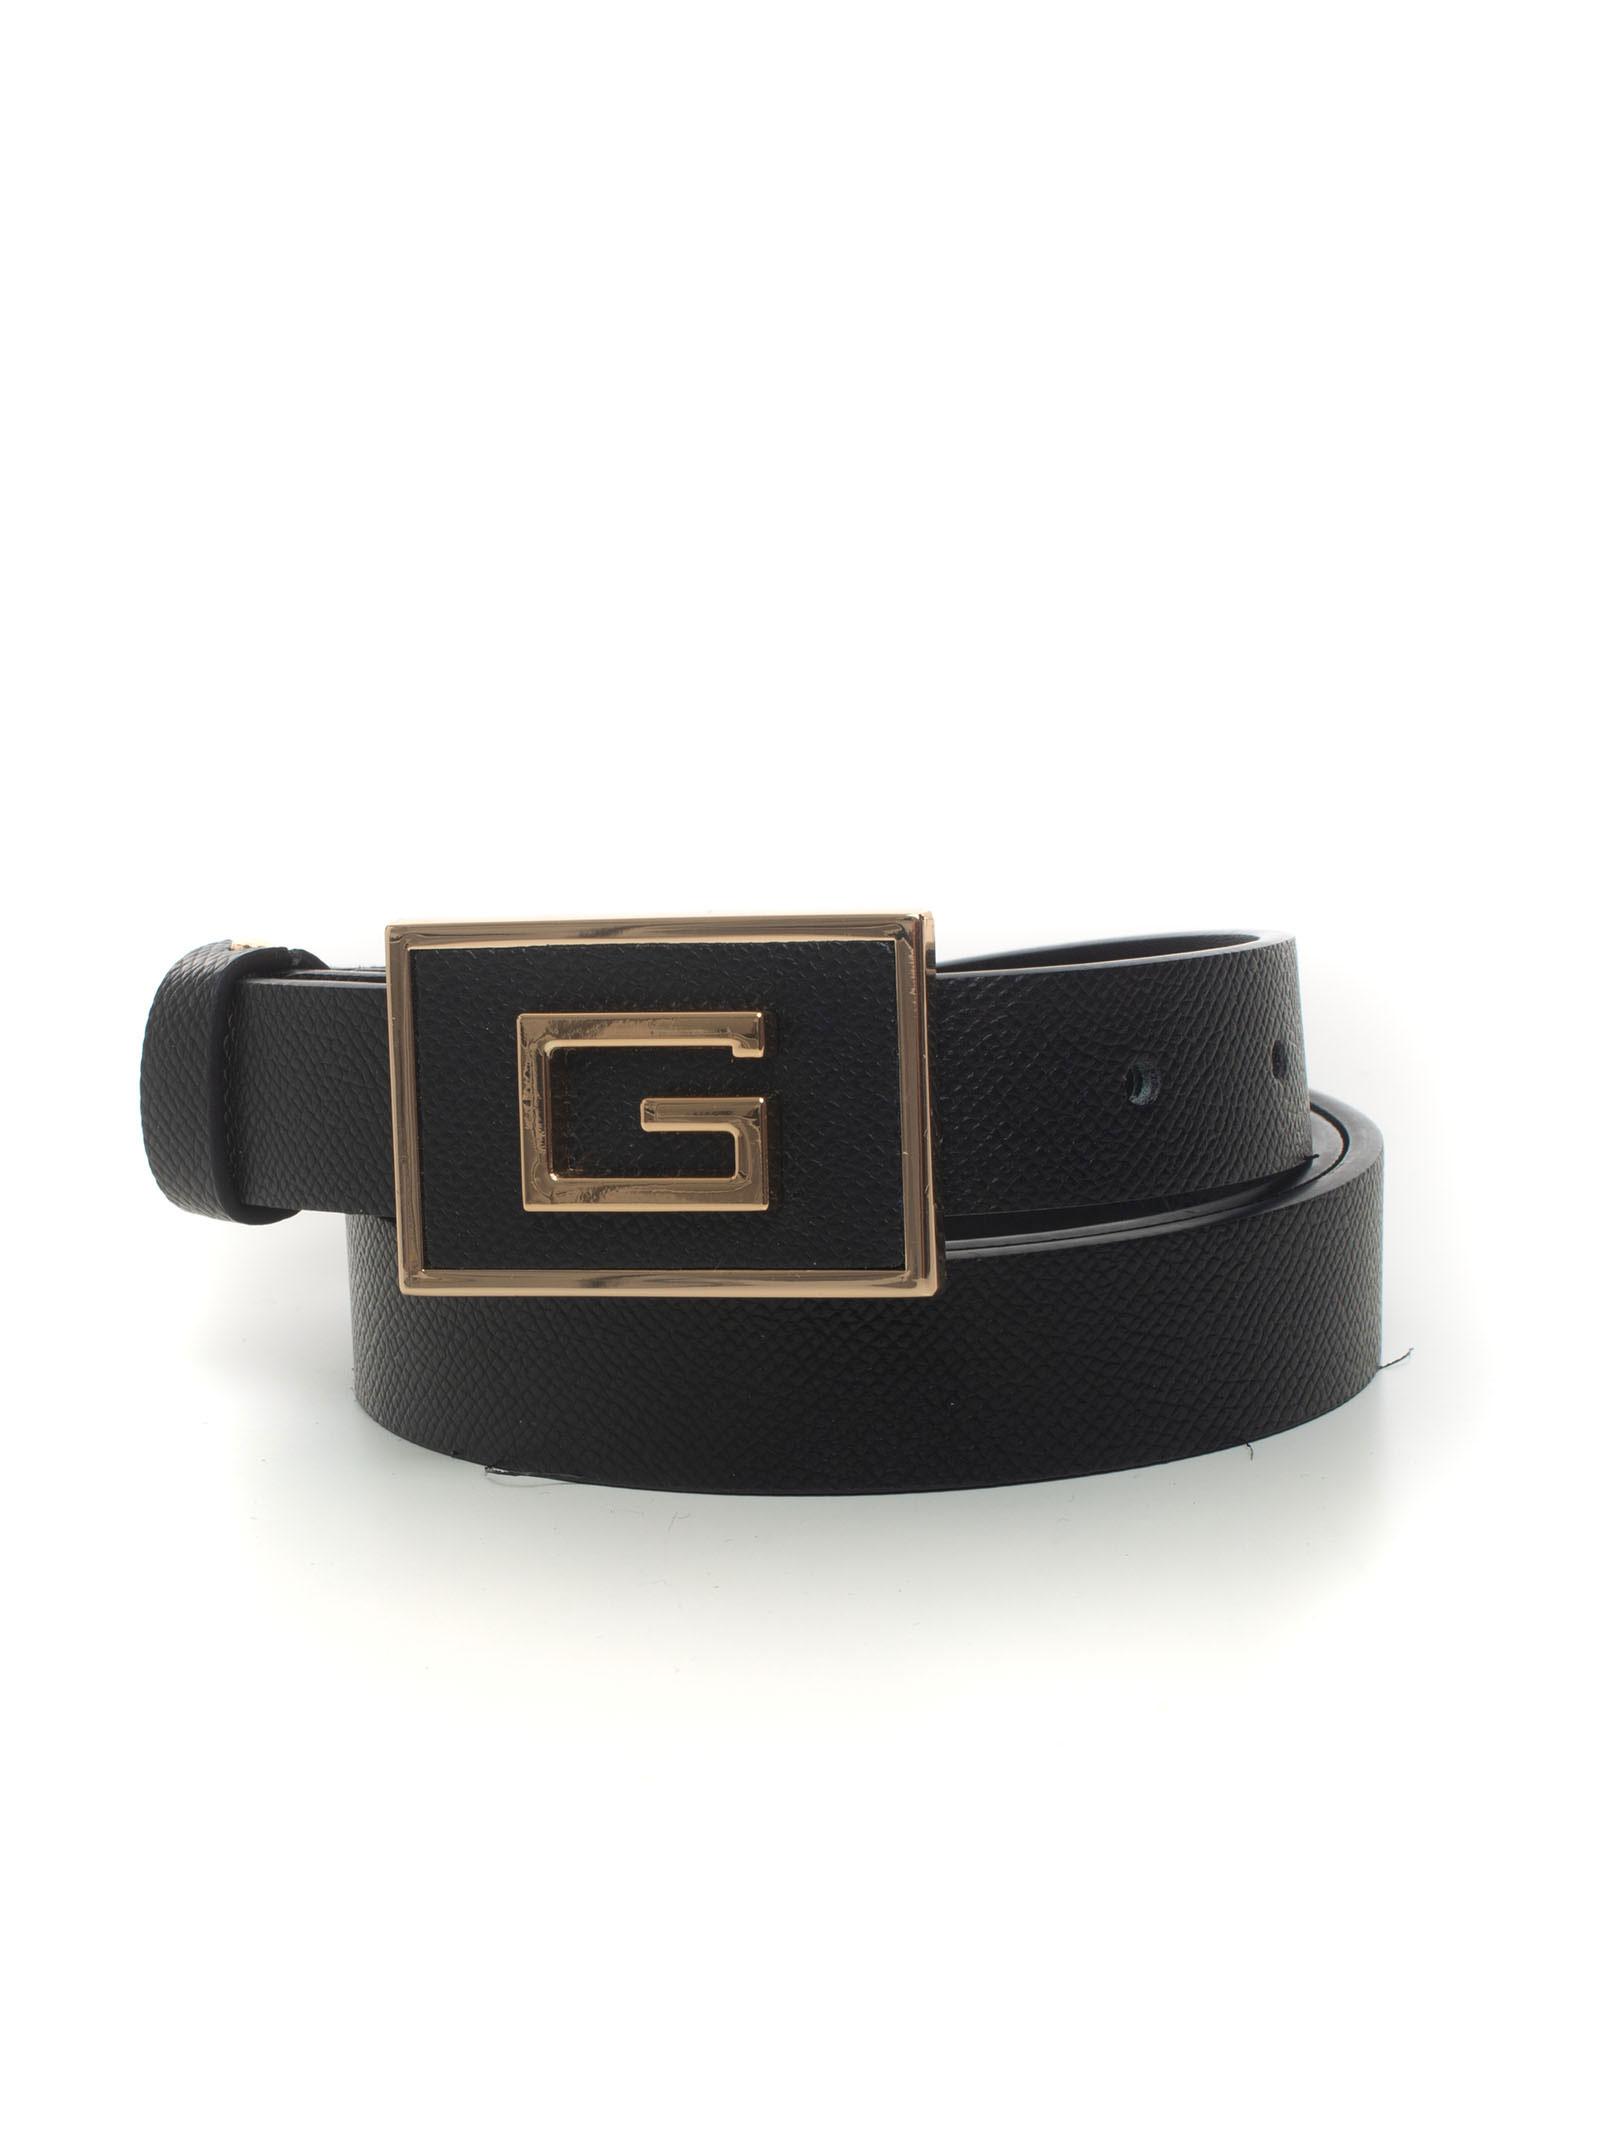 CINTURA GUESS GUESS | Cintura | BW7339-VIN25BLA